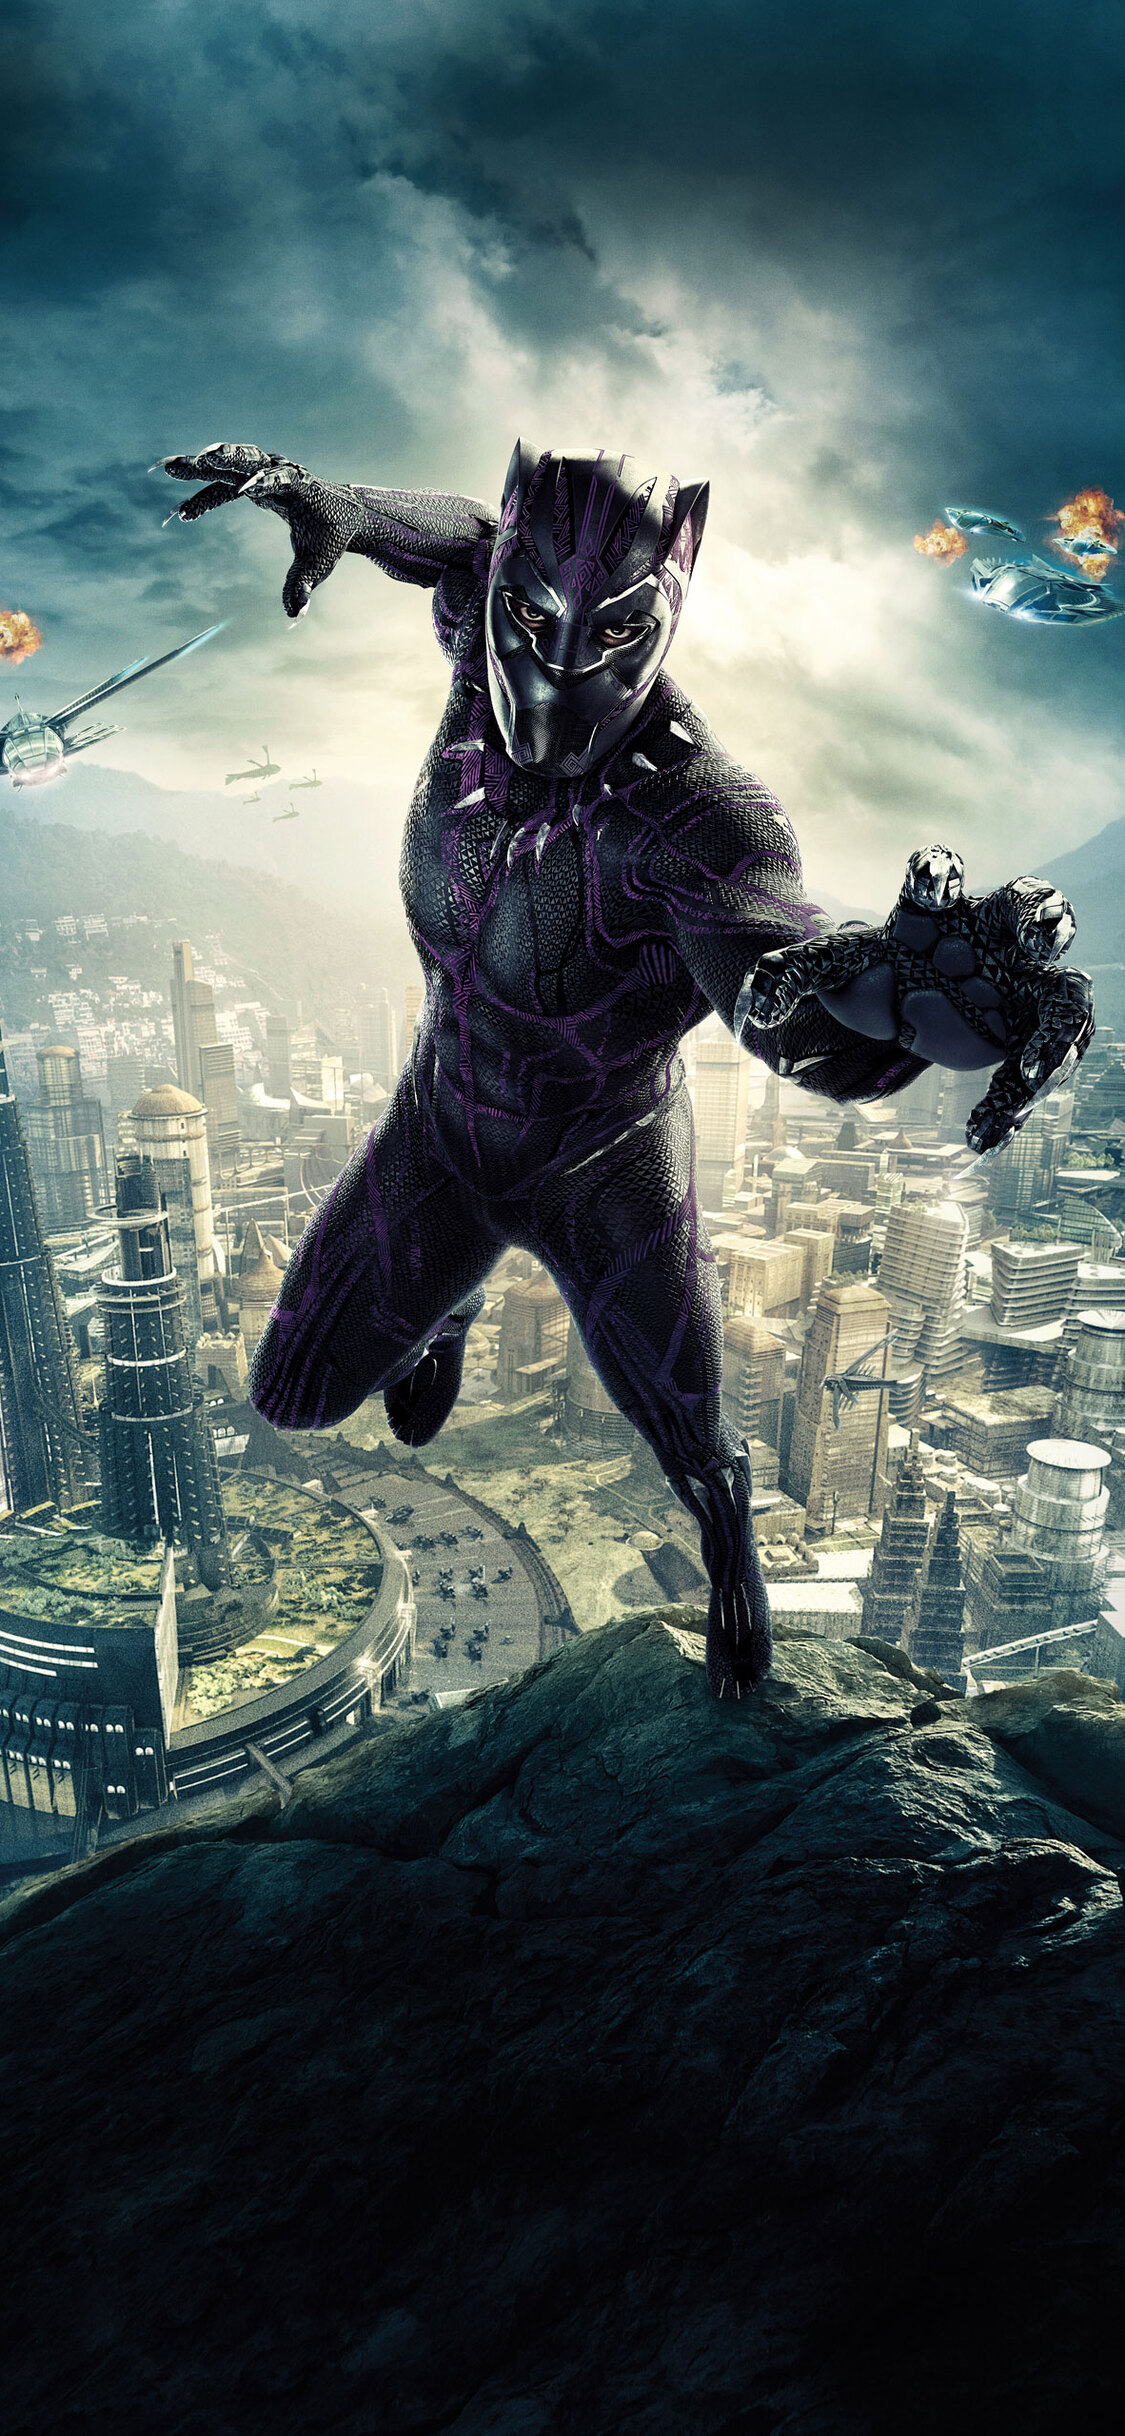 1125x2436 Black Panther 10k Poster Iphone XS,Iphone 10 ...